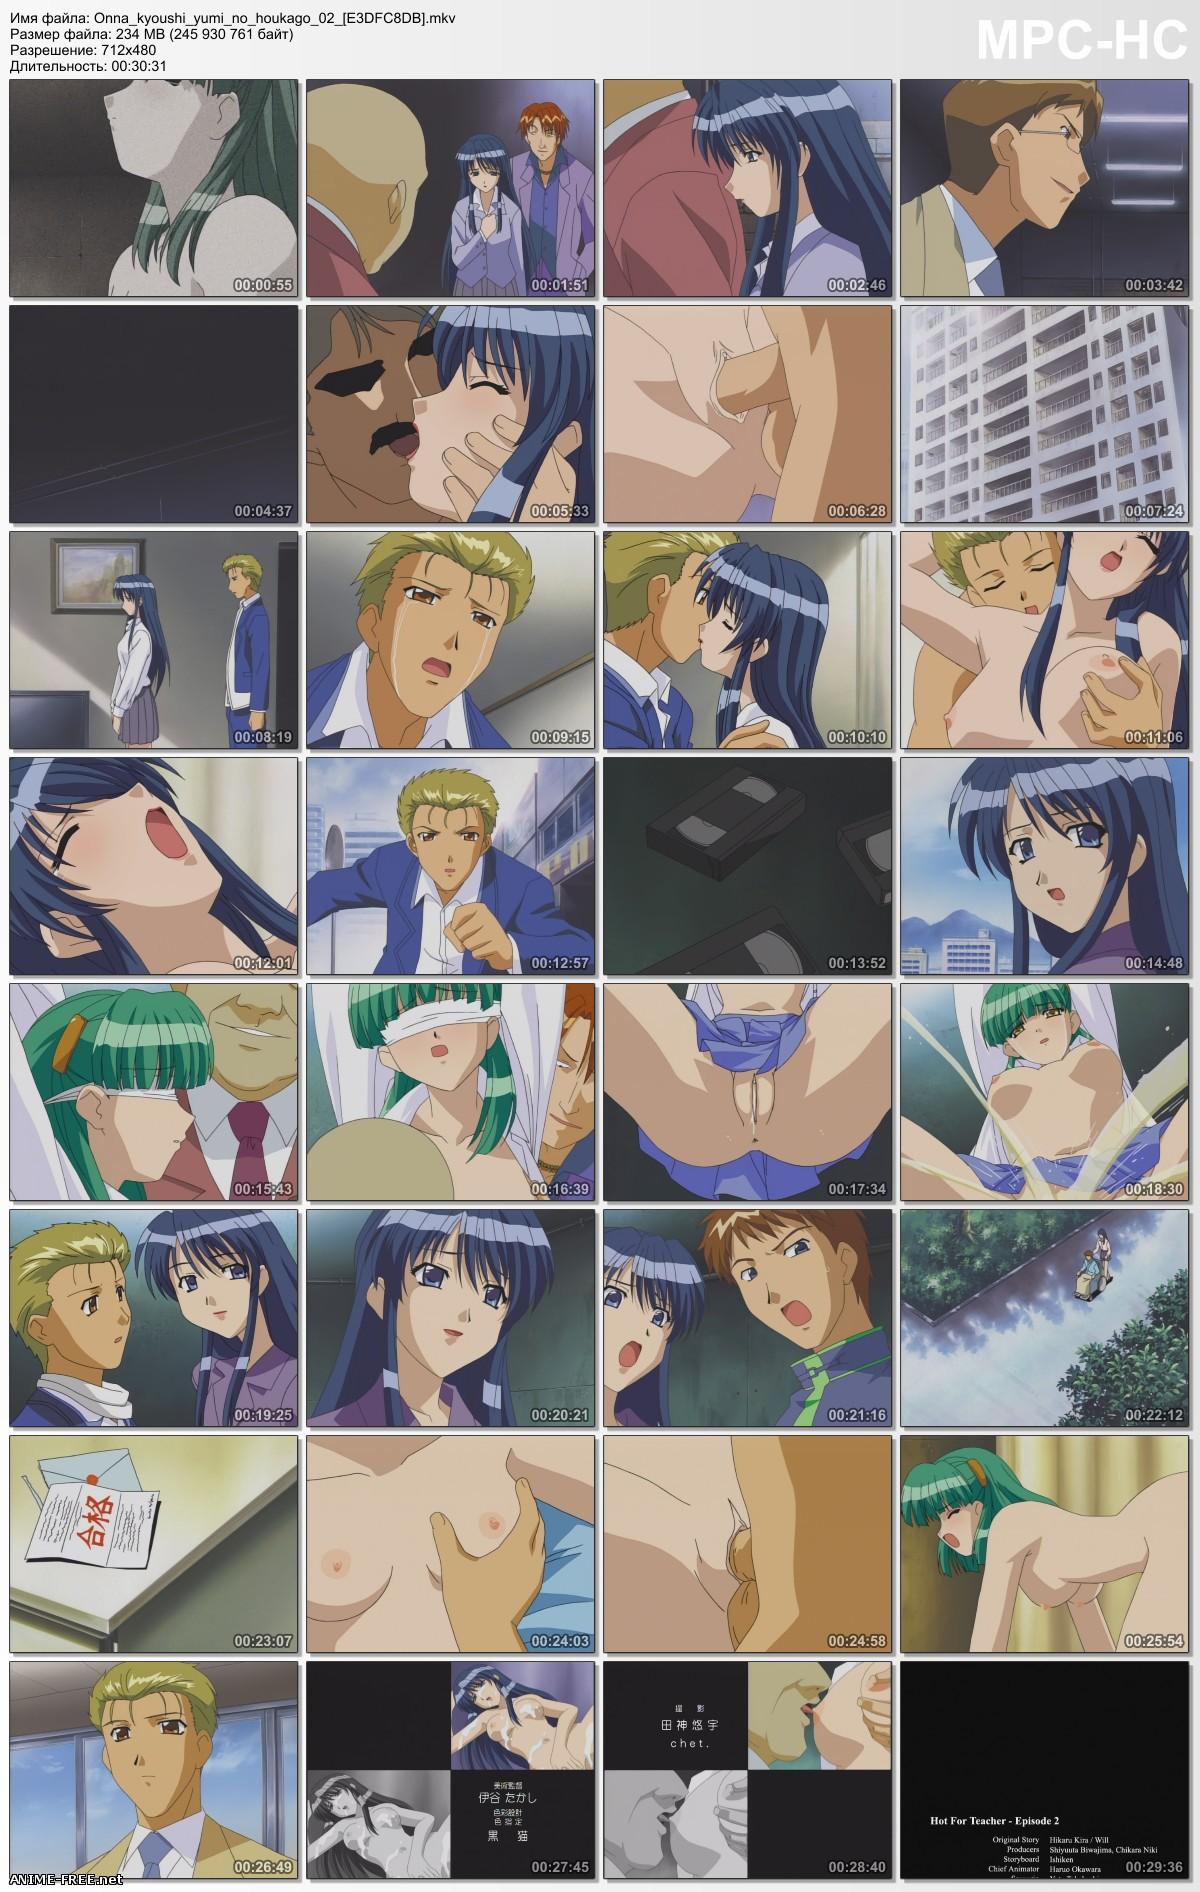 Hot for Teacher / Onna Kyoushi Yumi no Houkago / Горяченькое для учительницы [2 из 2] [RUS,JAP,ENG] Anime Hentai